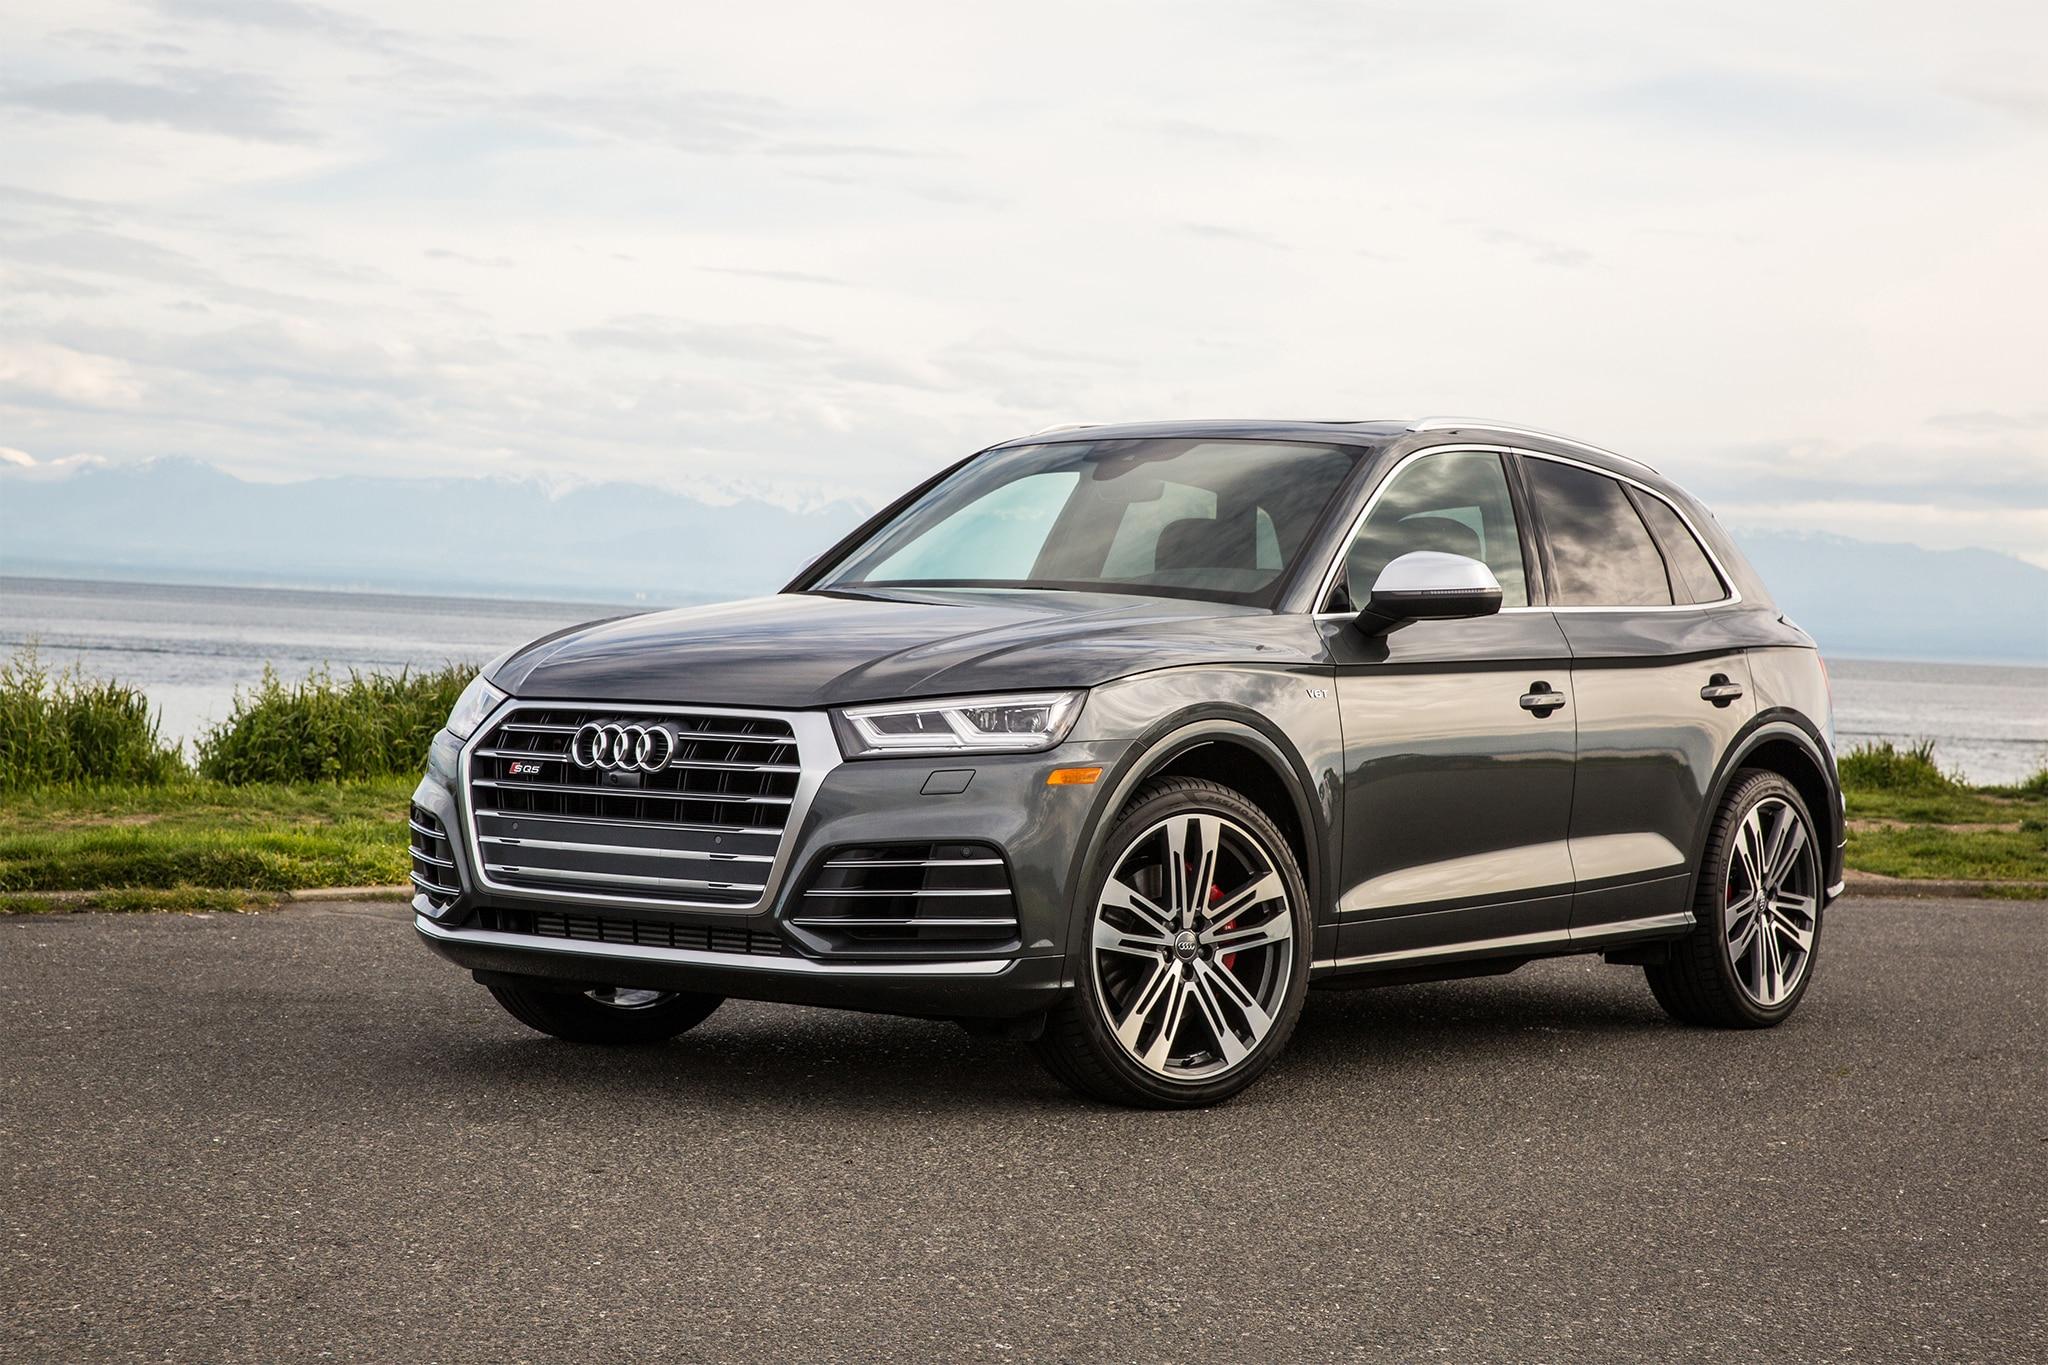 Audi Sq 3 2017 >> 2018 Audi SQ5 First Drive Review | Automobile Magazine